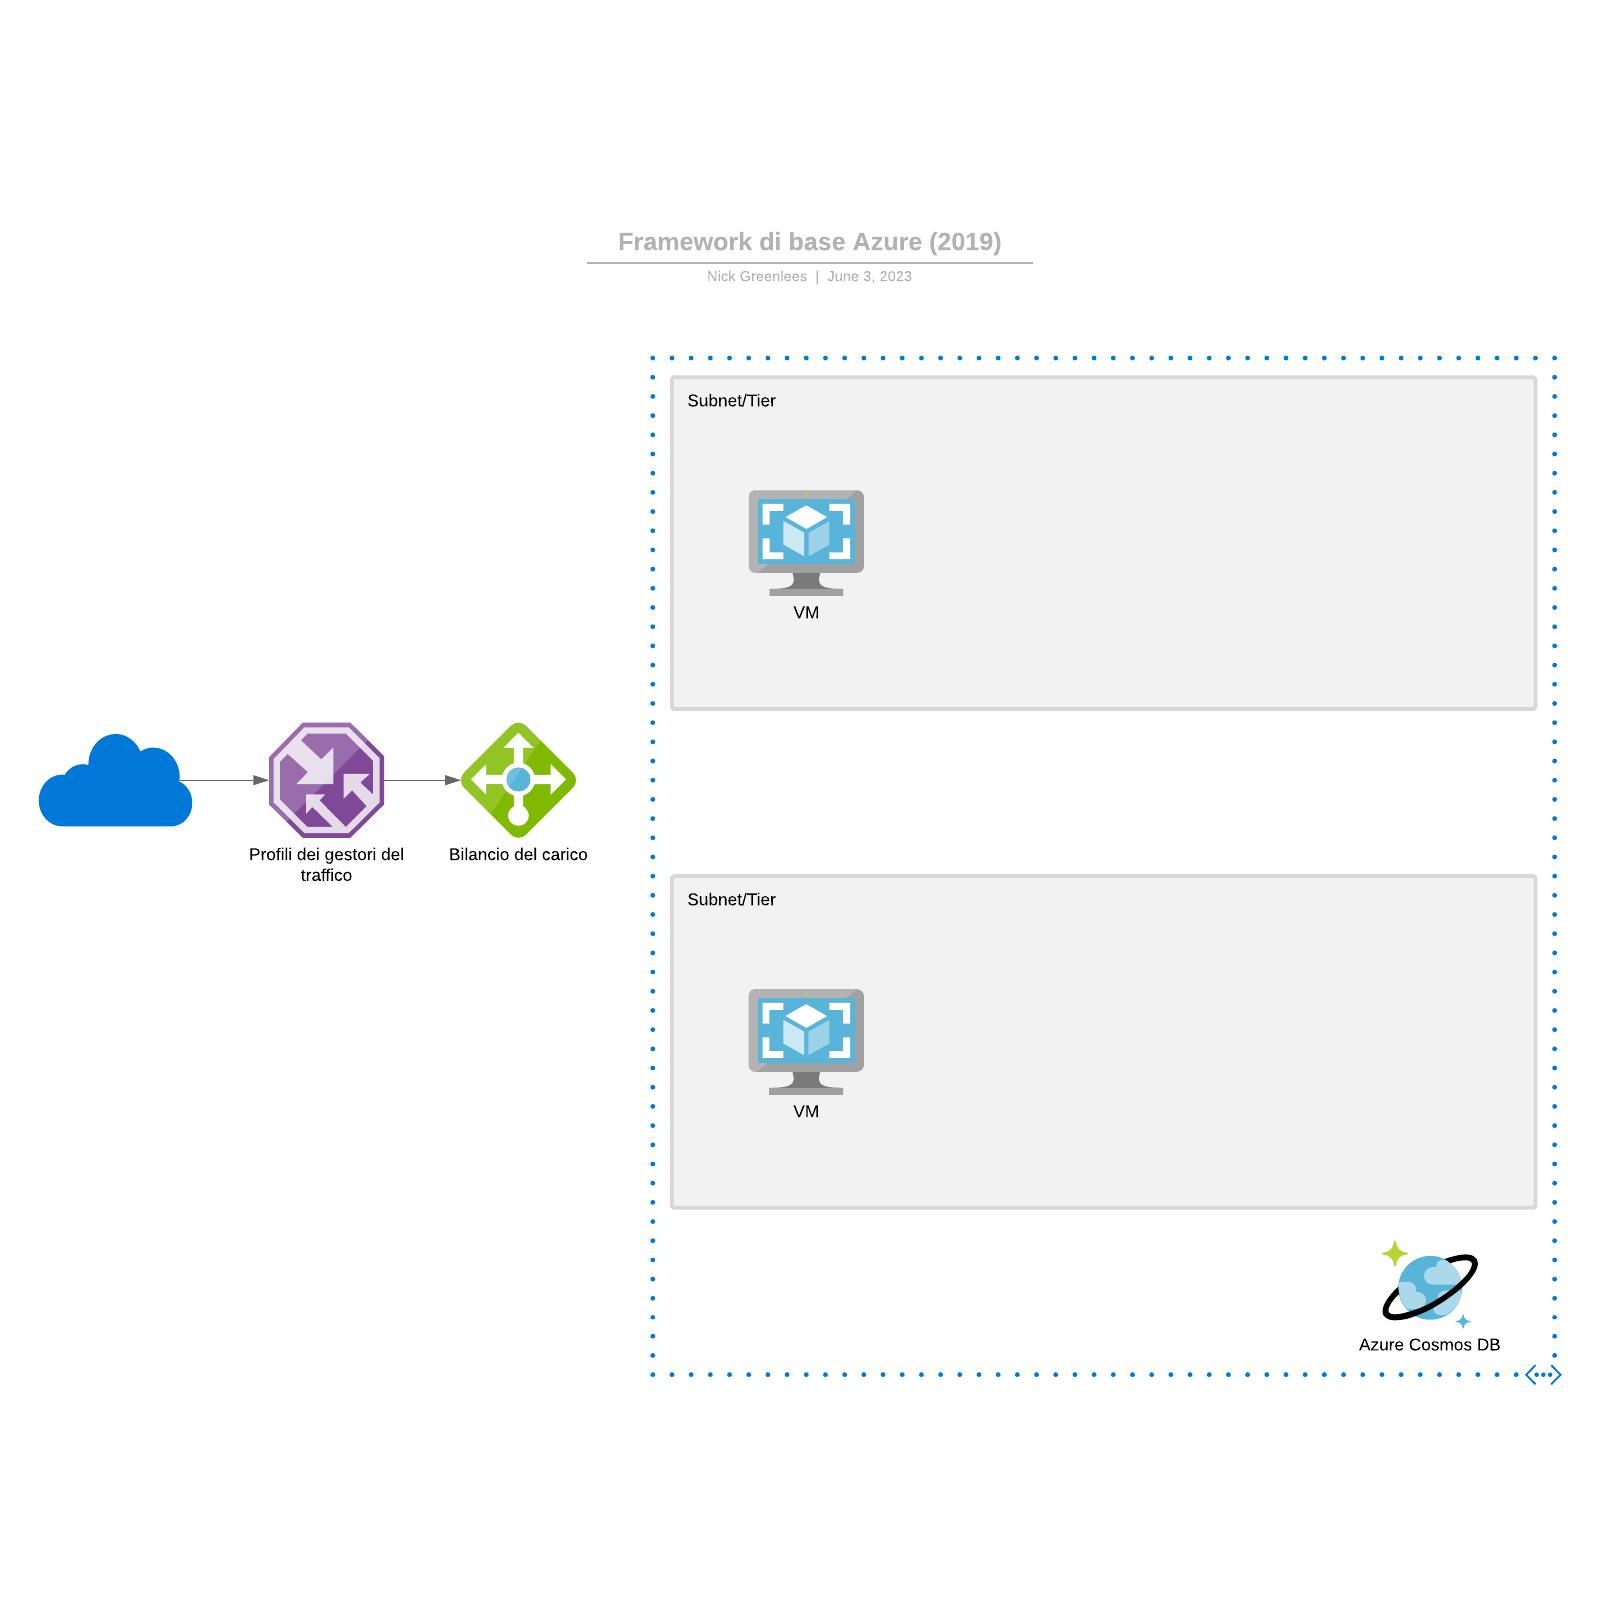 Framework di base Azure (2019)